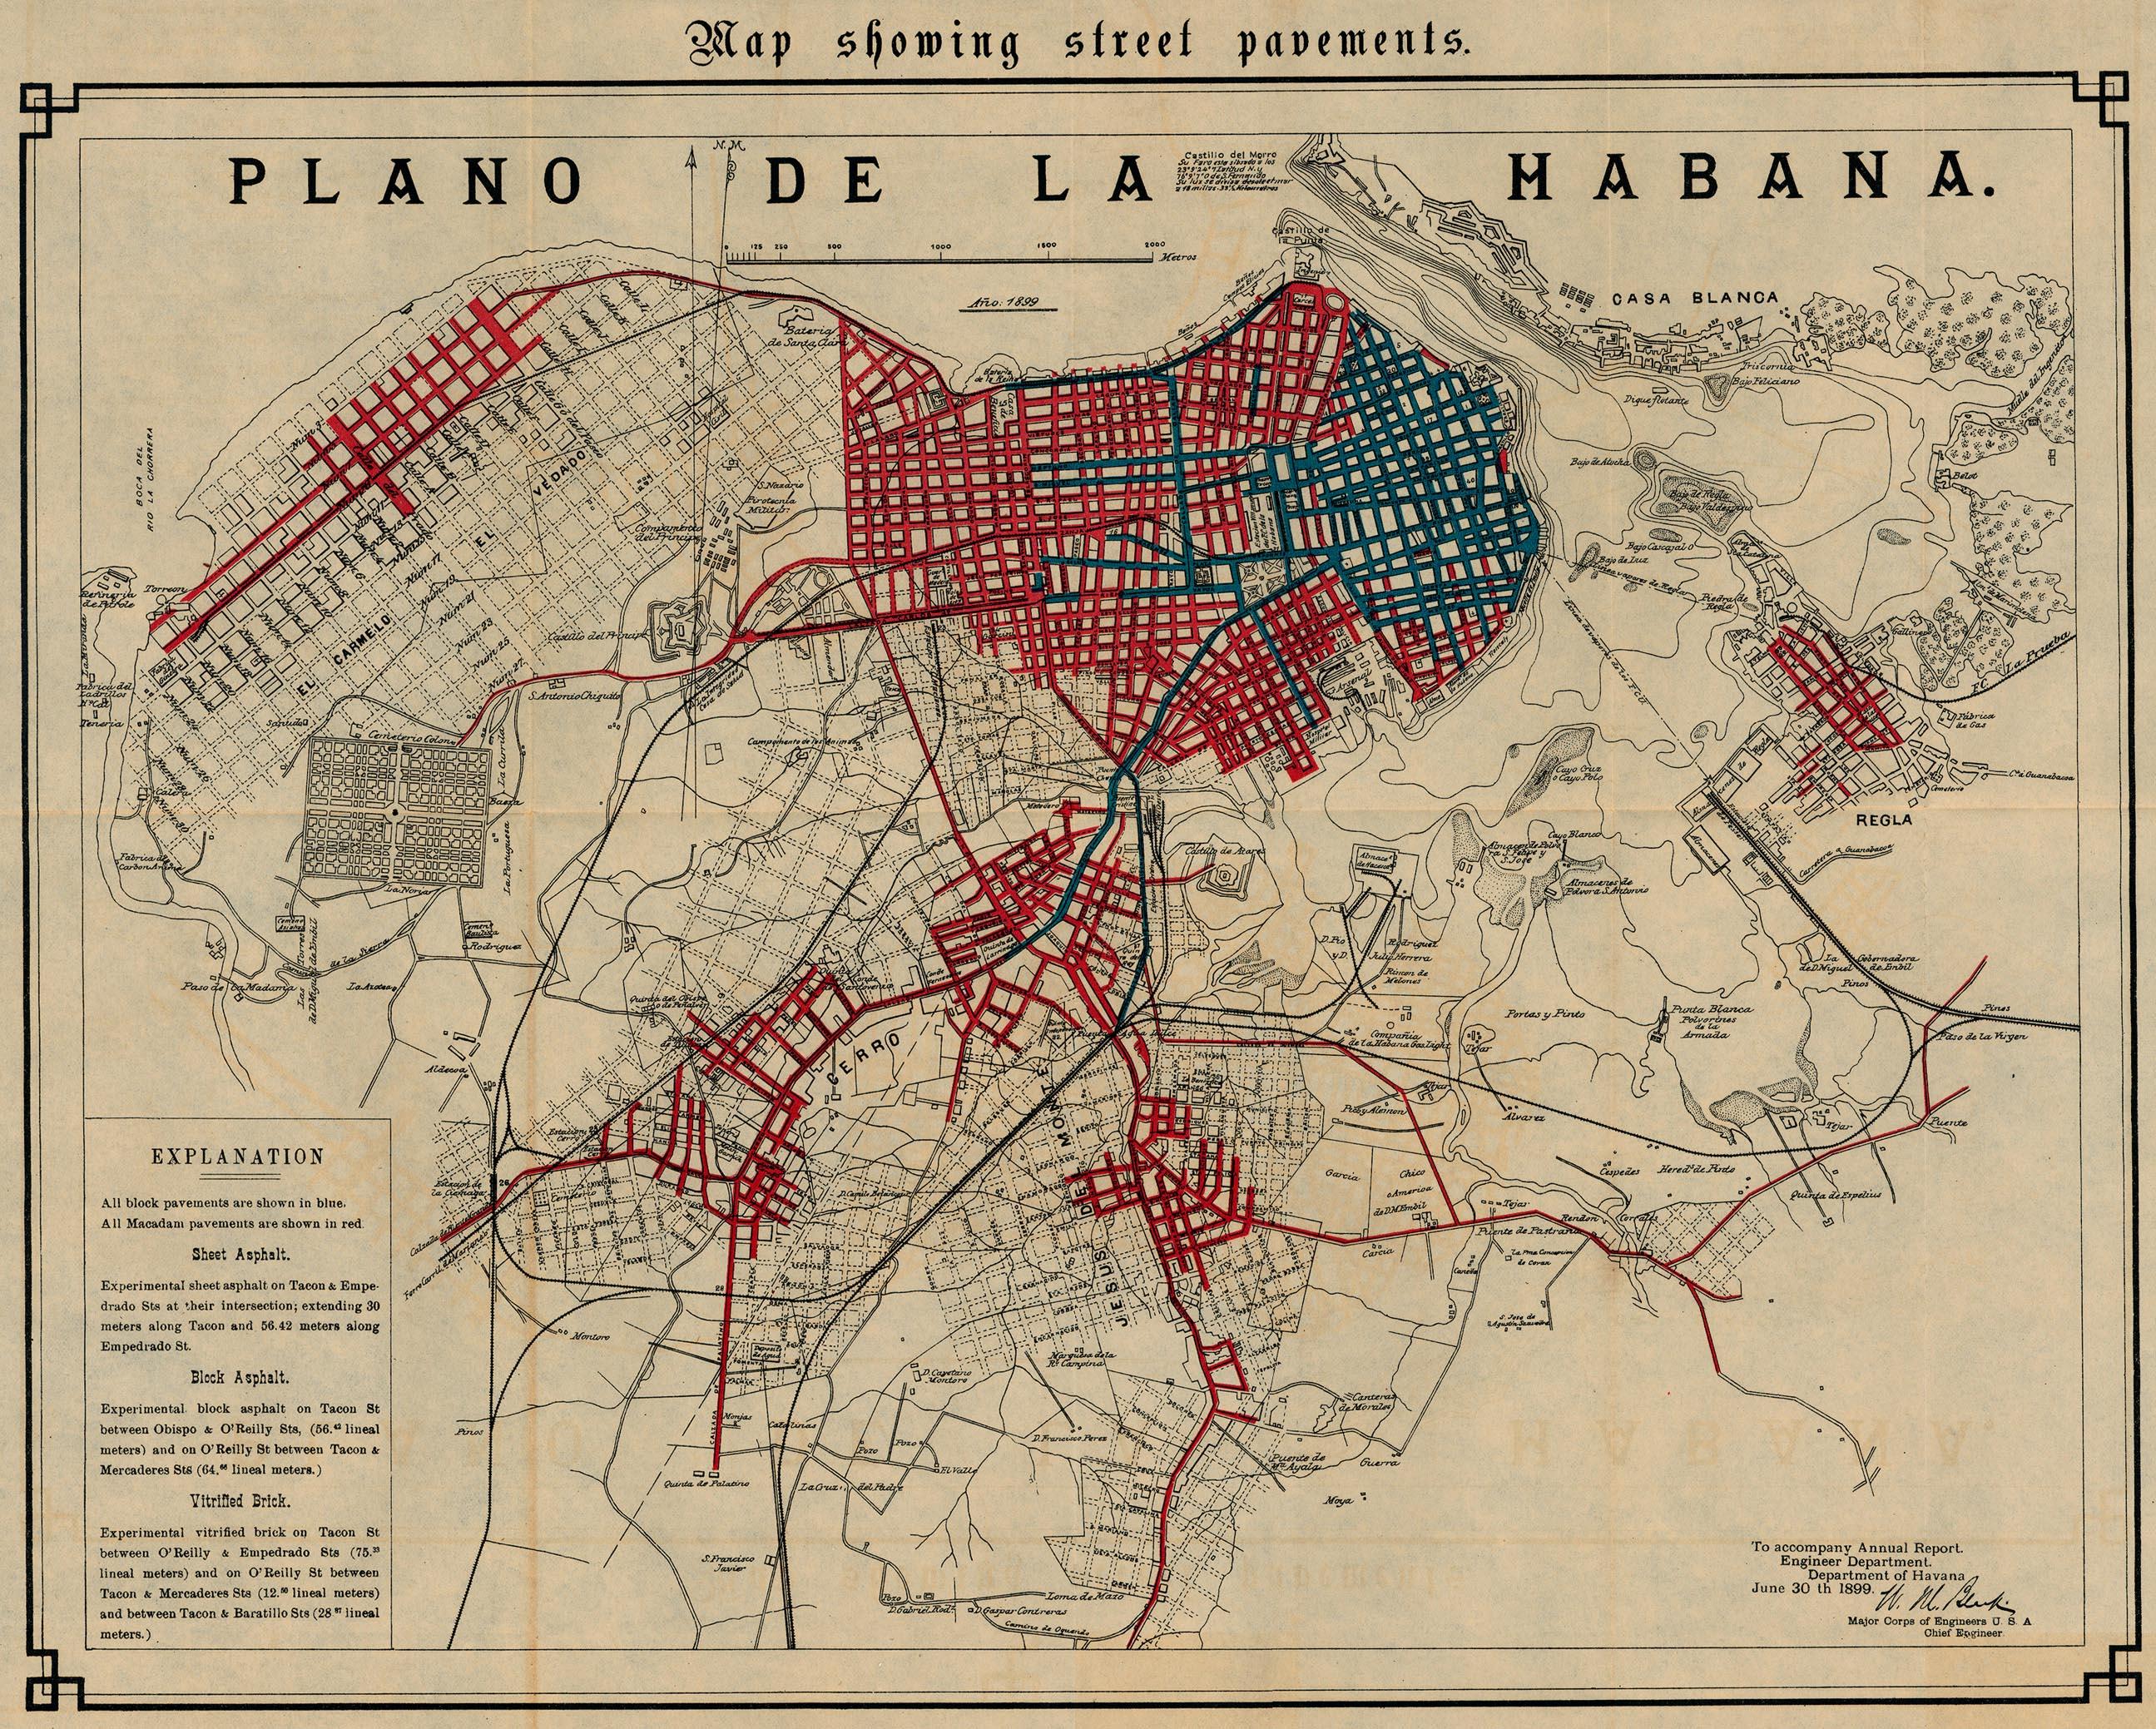 Havana Map Showing Street Pavements, Cuba 1899